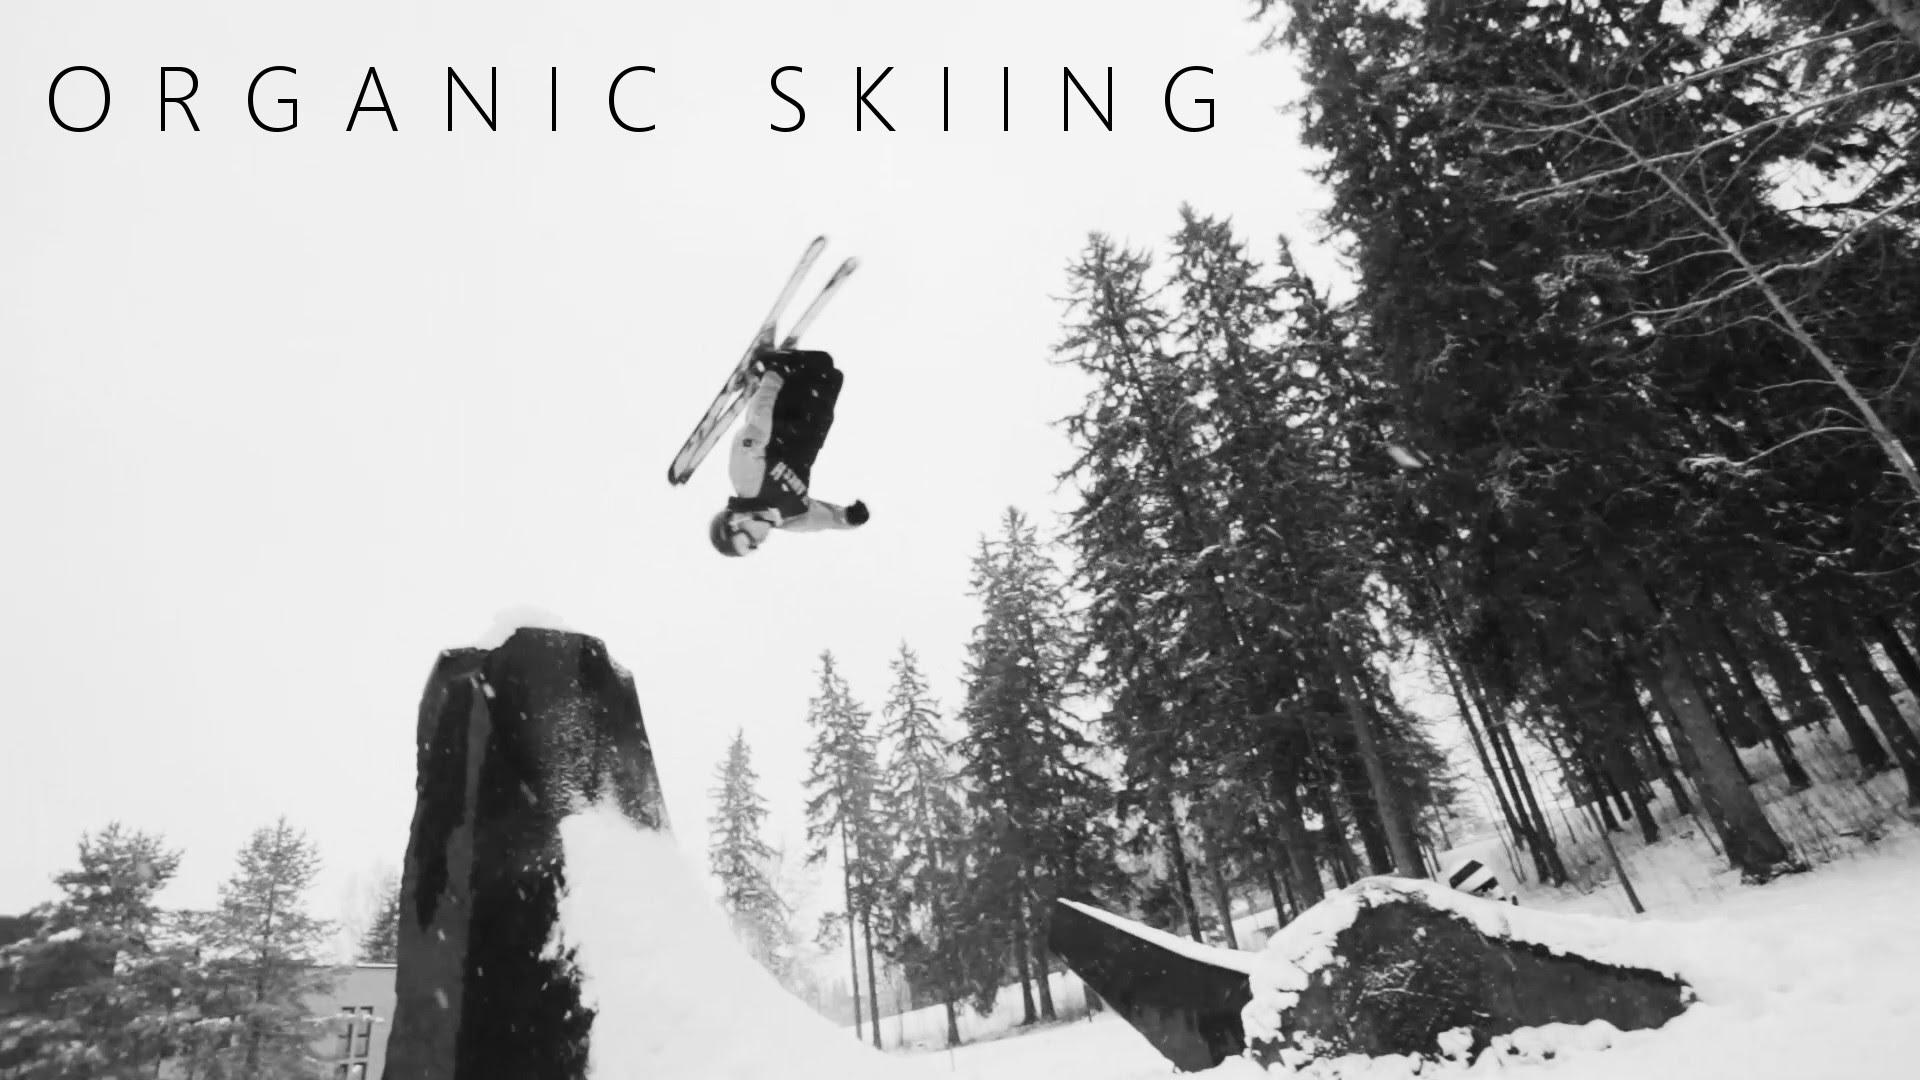 Juho Kilkki of Real Skifi – Organic Skiing